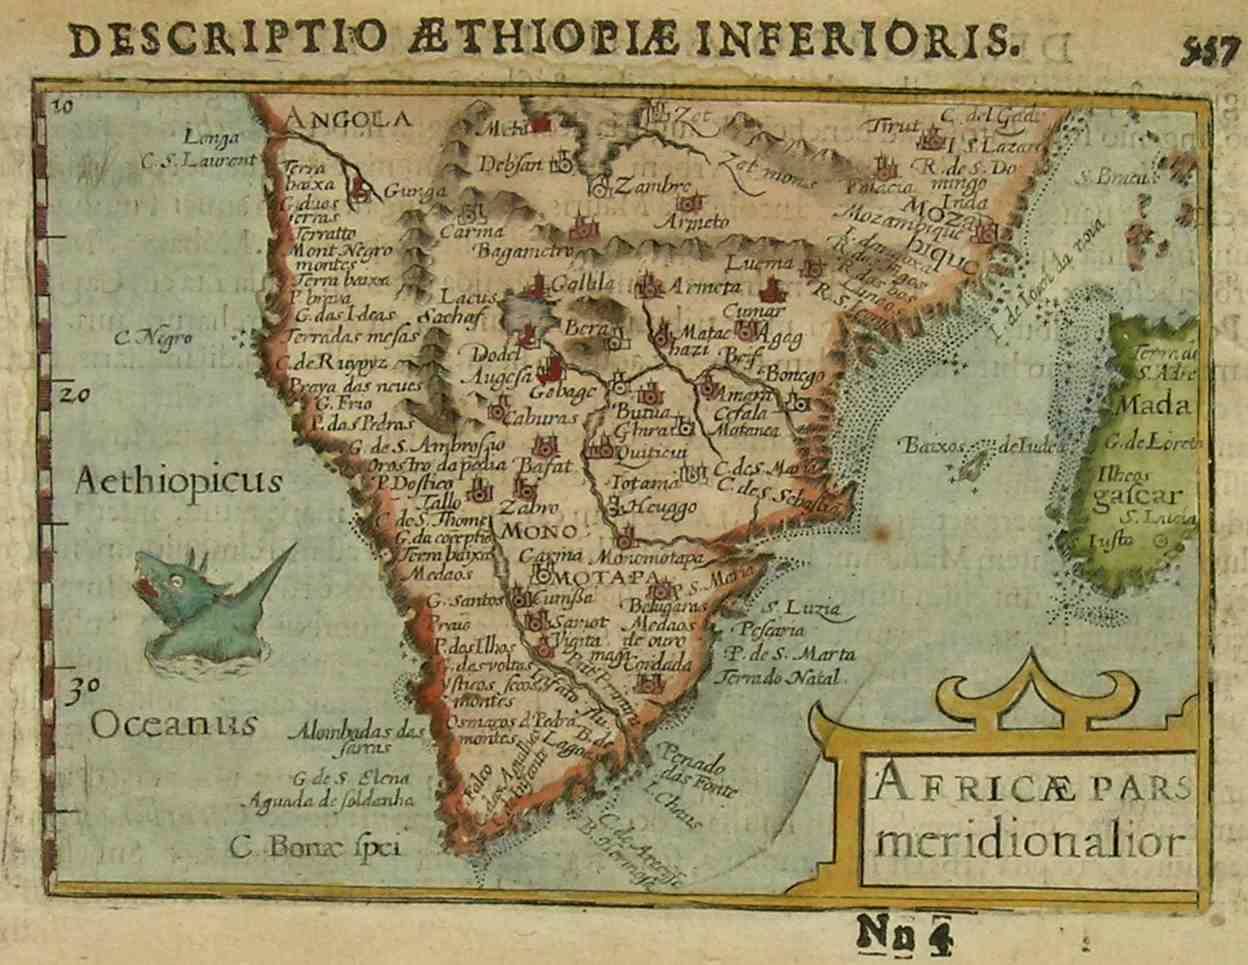 South Africa Africae Pars Meridionalior Michael Jennings Antique